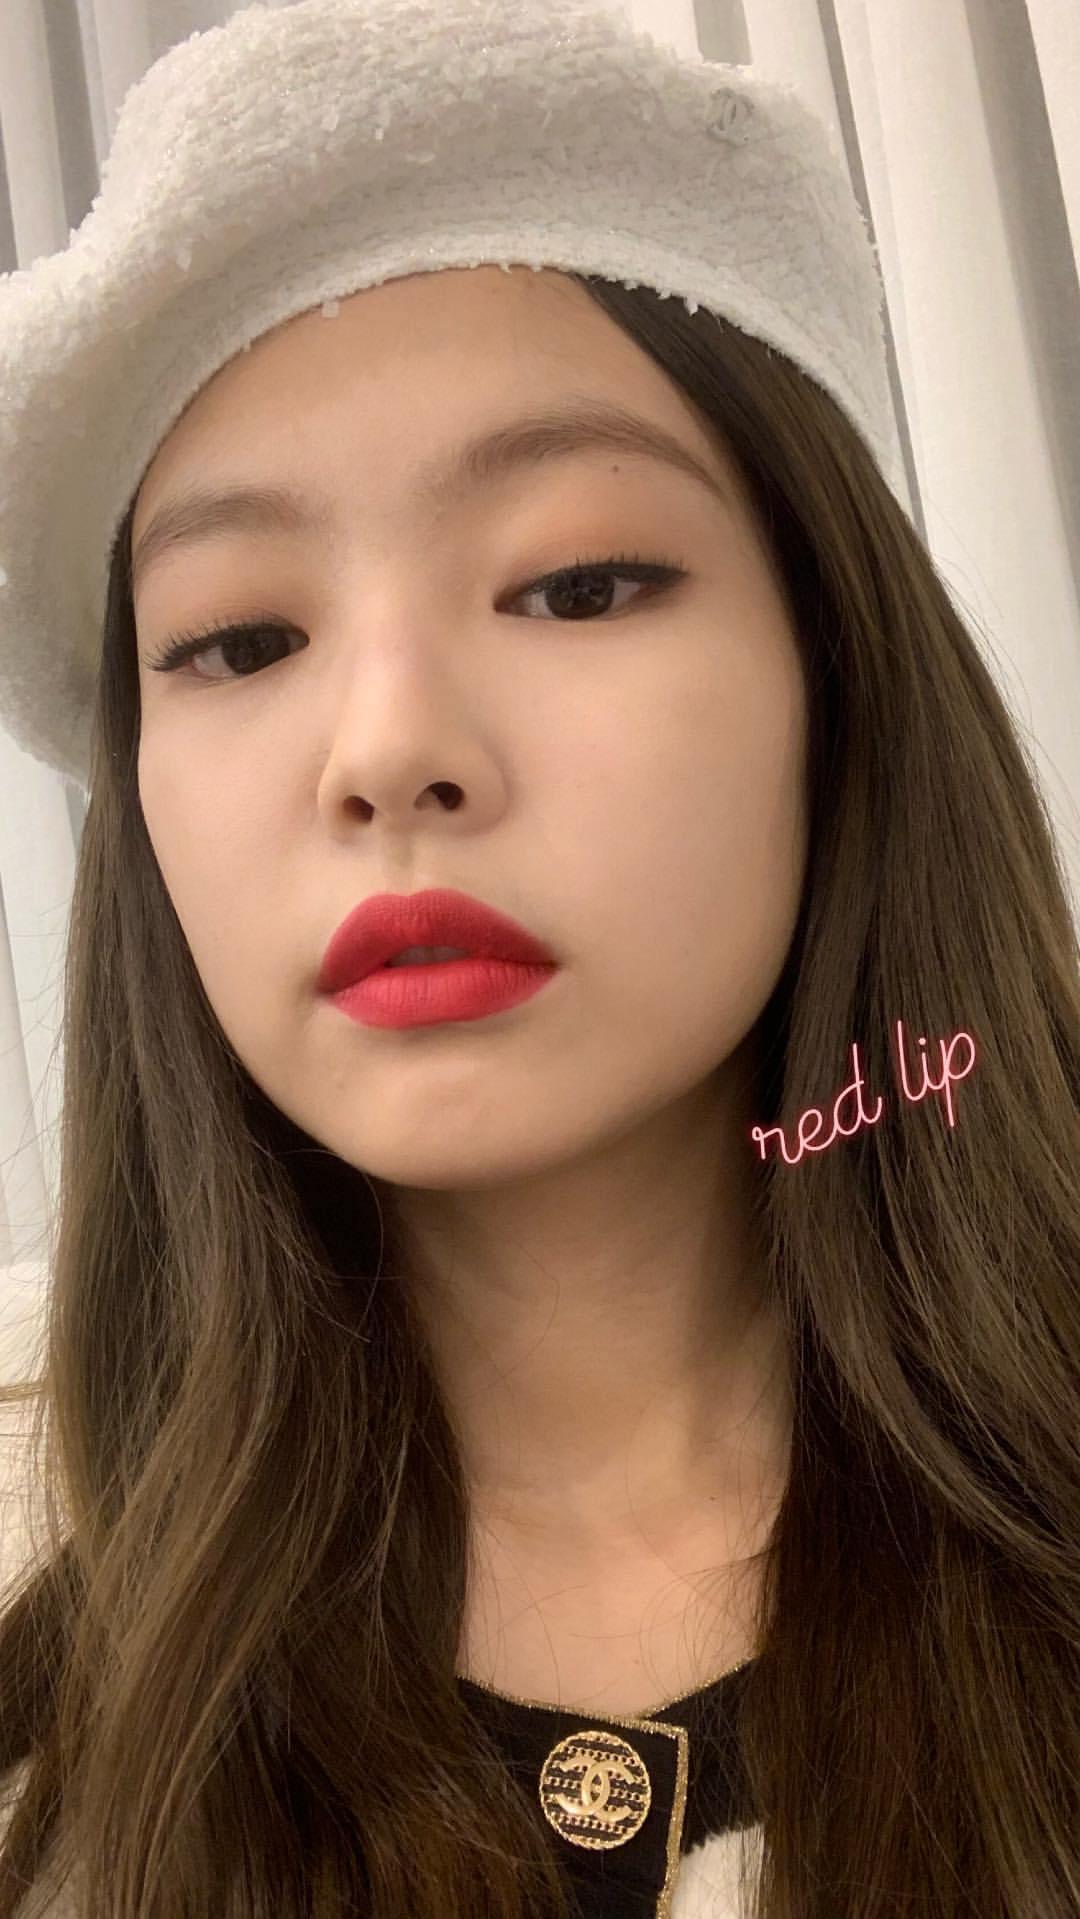 4-BLACKPINK-Jennie-Instagram-Story-13-November-2018